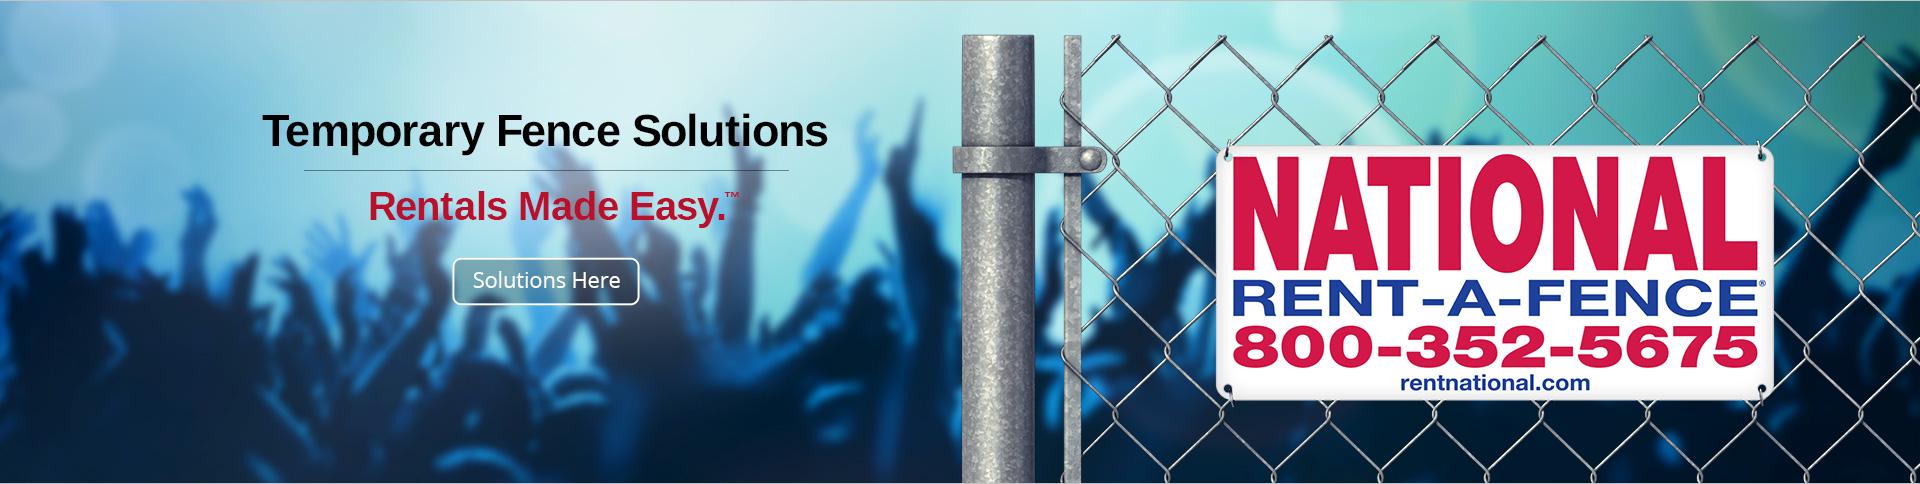 Rent A Fence Event Amp Construction Rentals Events